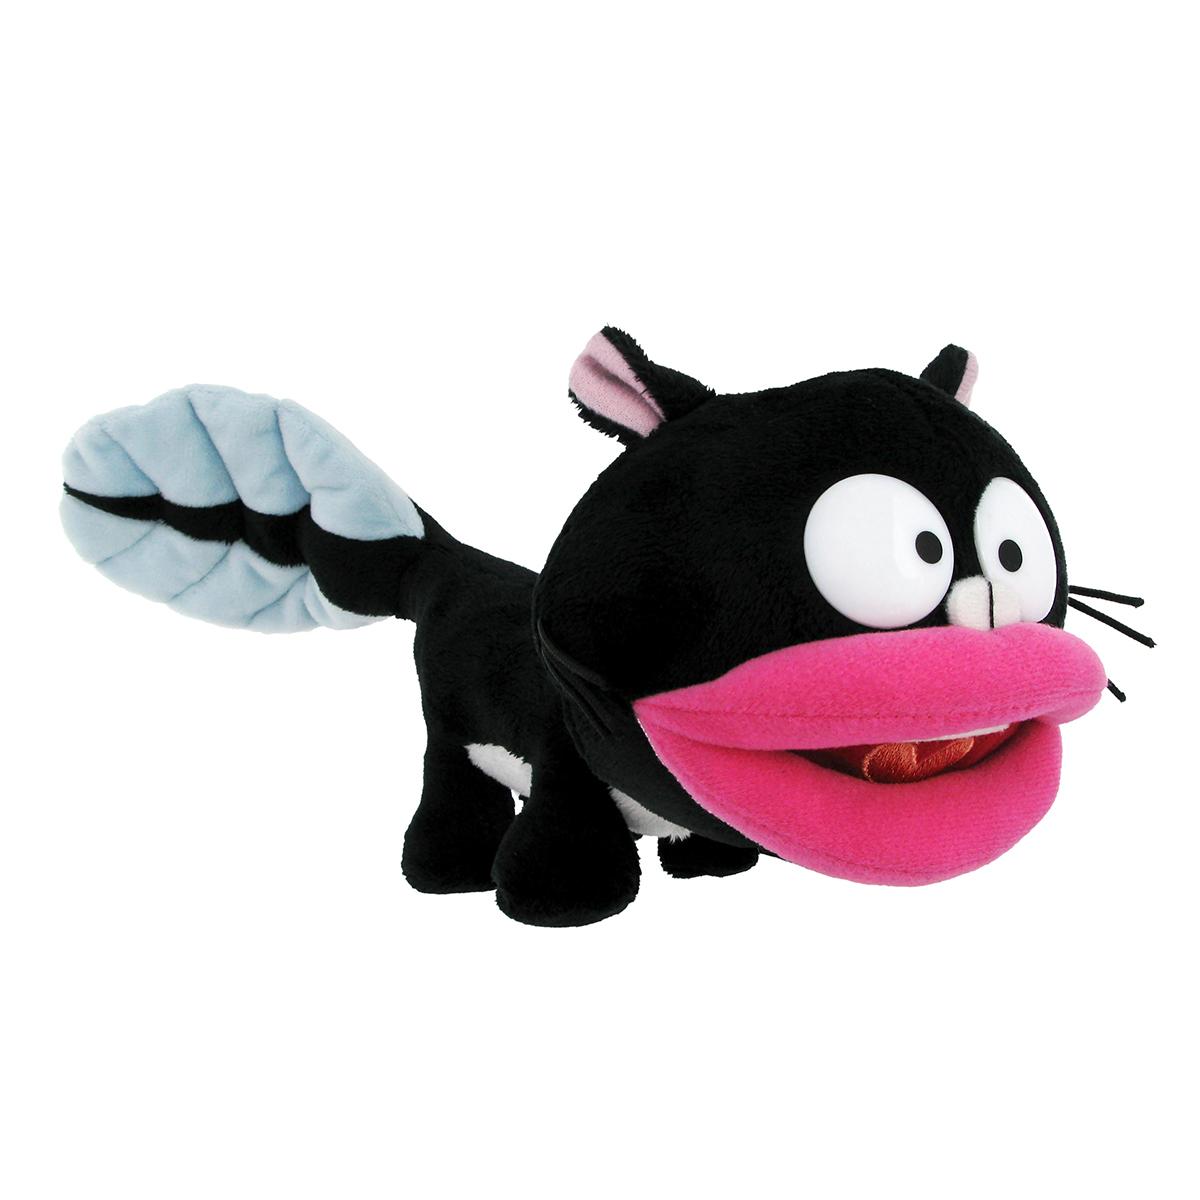 Eel Dog soft toy